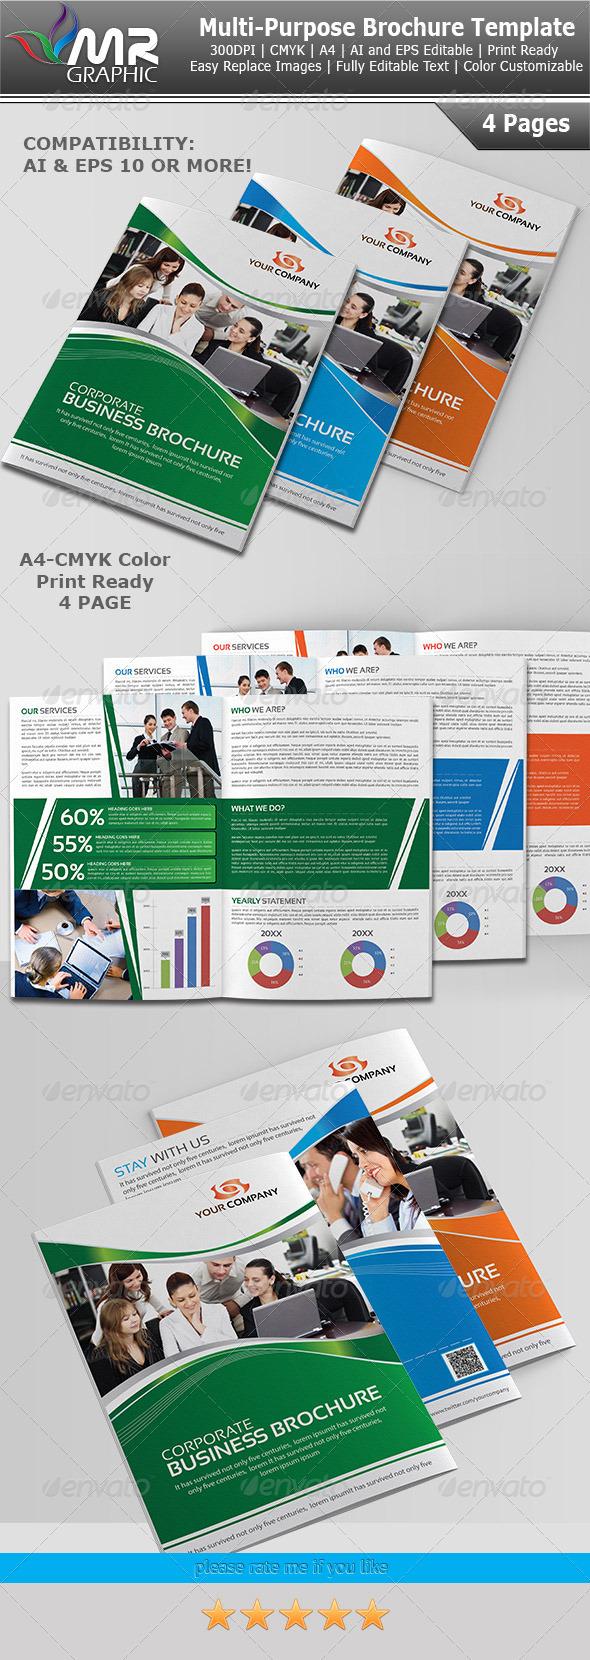 Multipurpose Business Brochure Template Vol-06 - Corporate Brochures